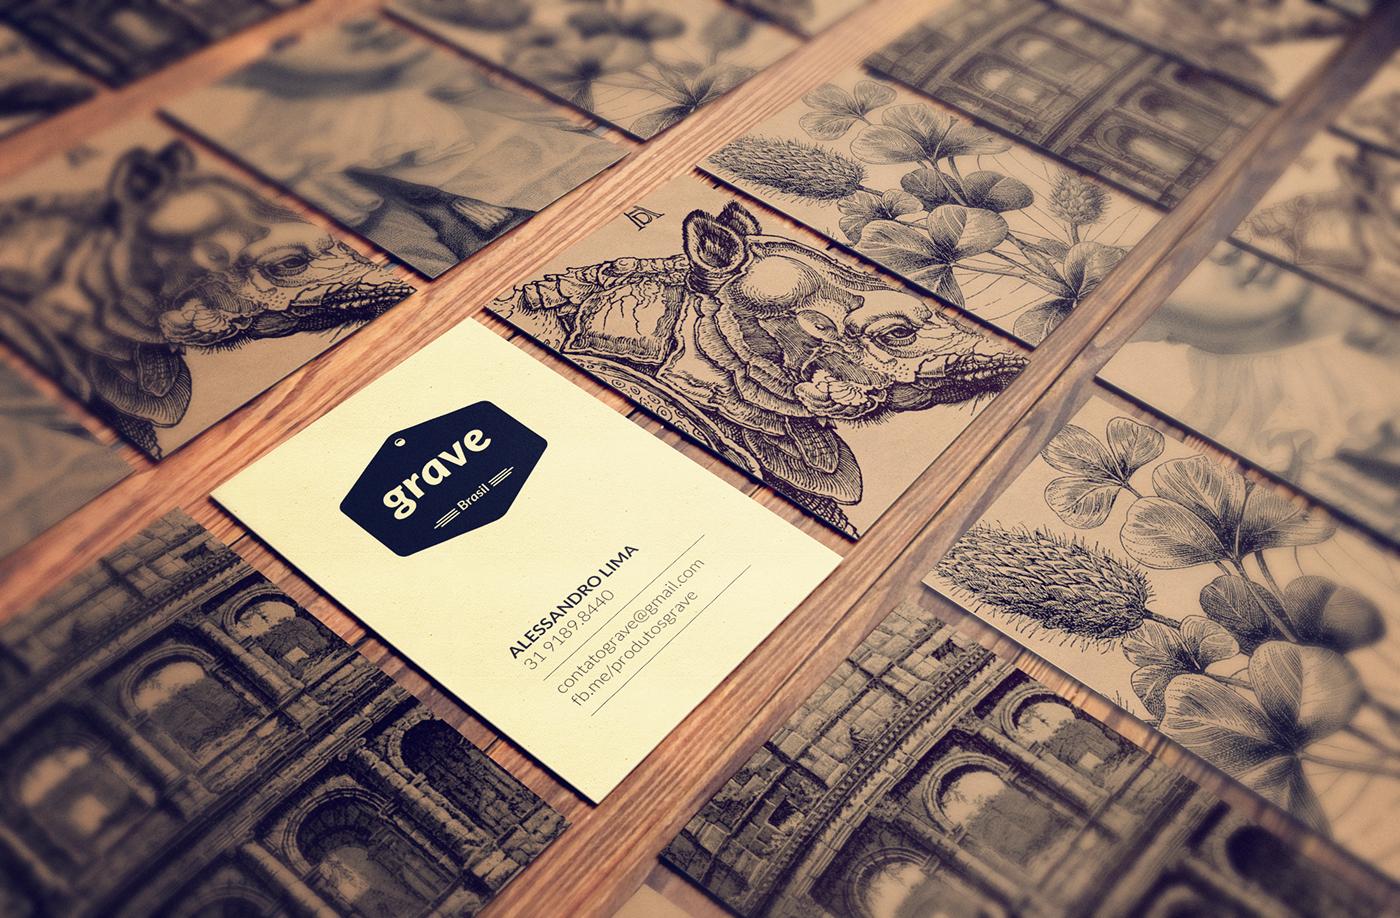 GRAVURA etching engraving business card brochure fold ecobag brand vintage bookmark fanpage Kraft texture color